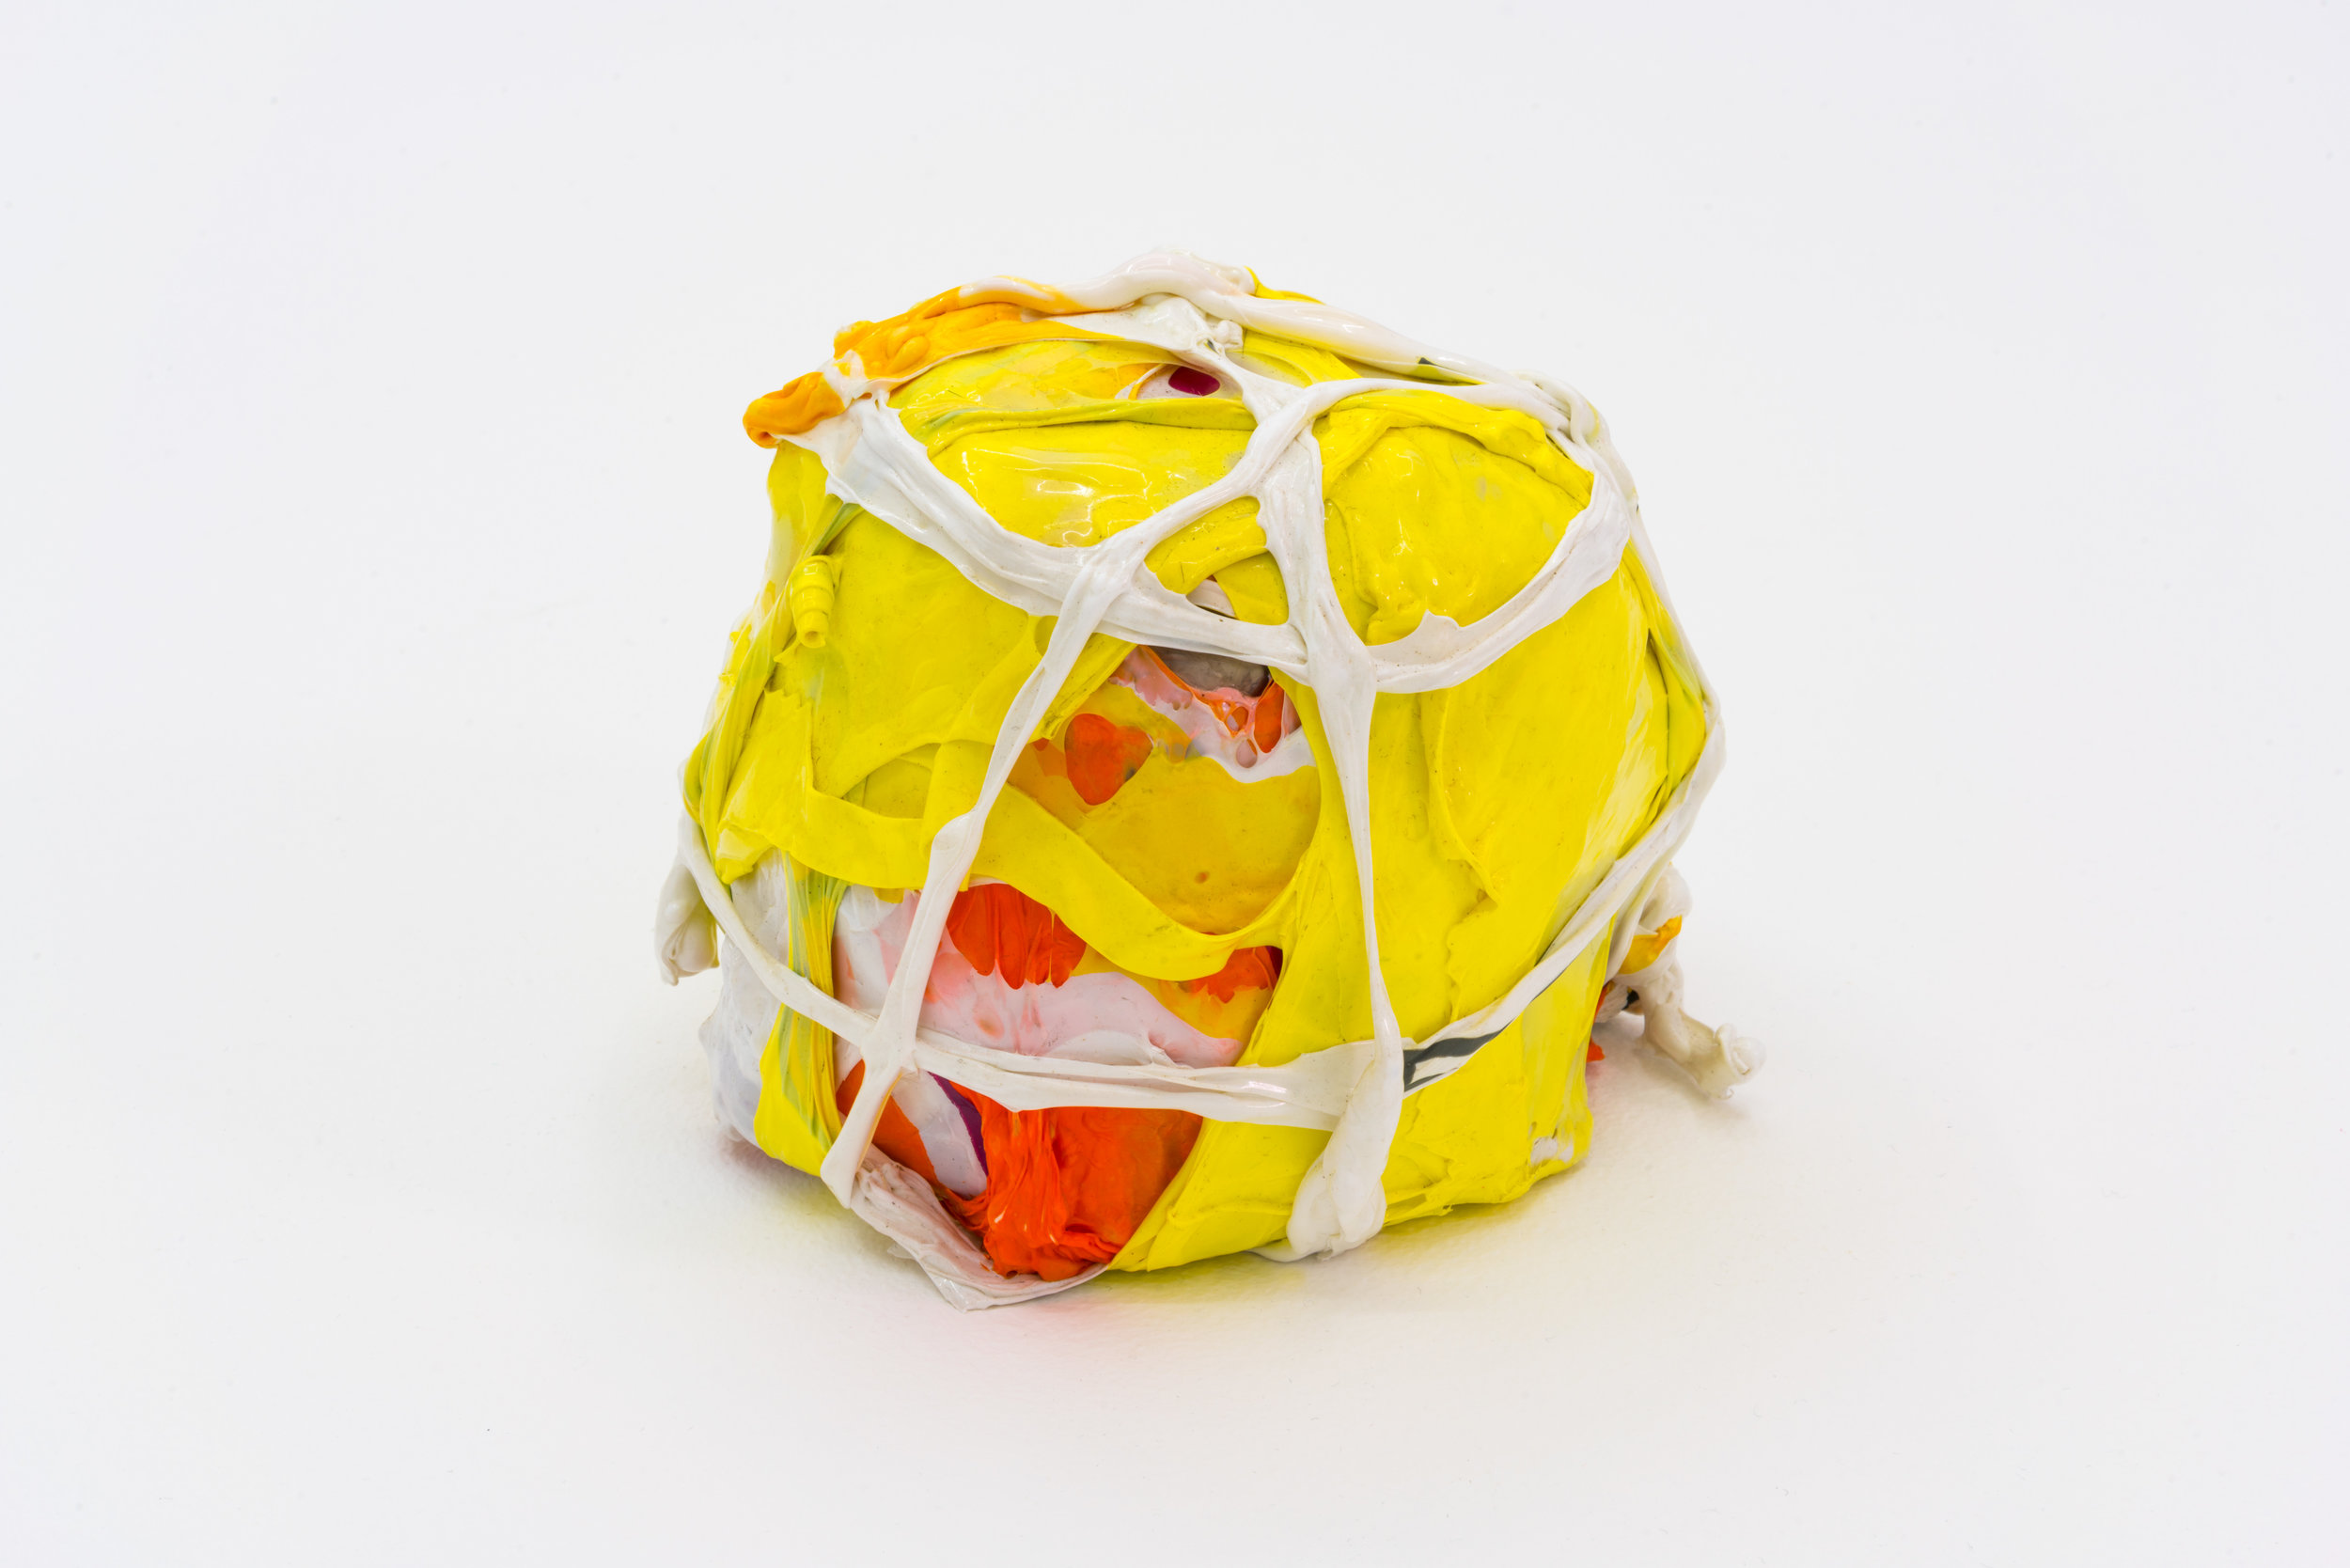 Remko Scha,  Plastic Meltdown , 1962-1992, Plastic, 10 x 12 x 11 cm